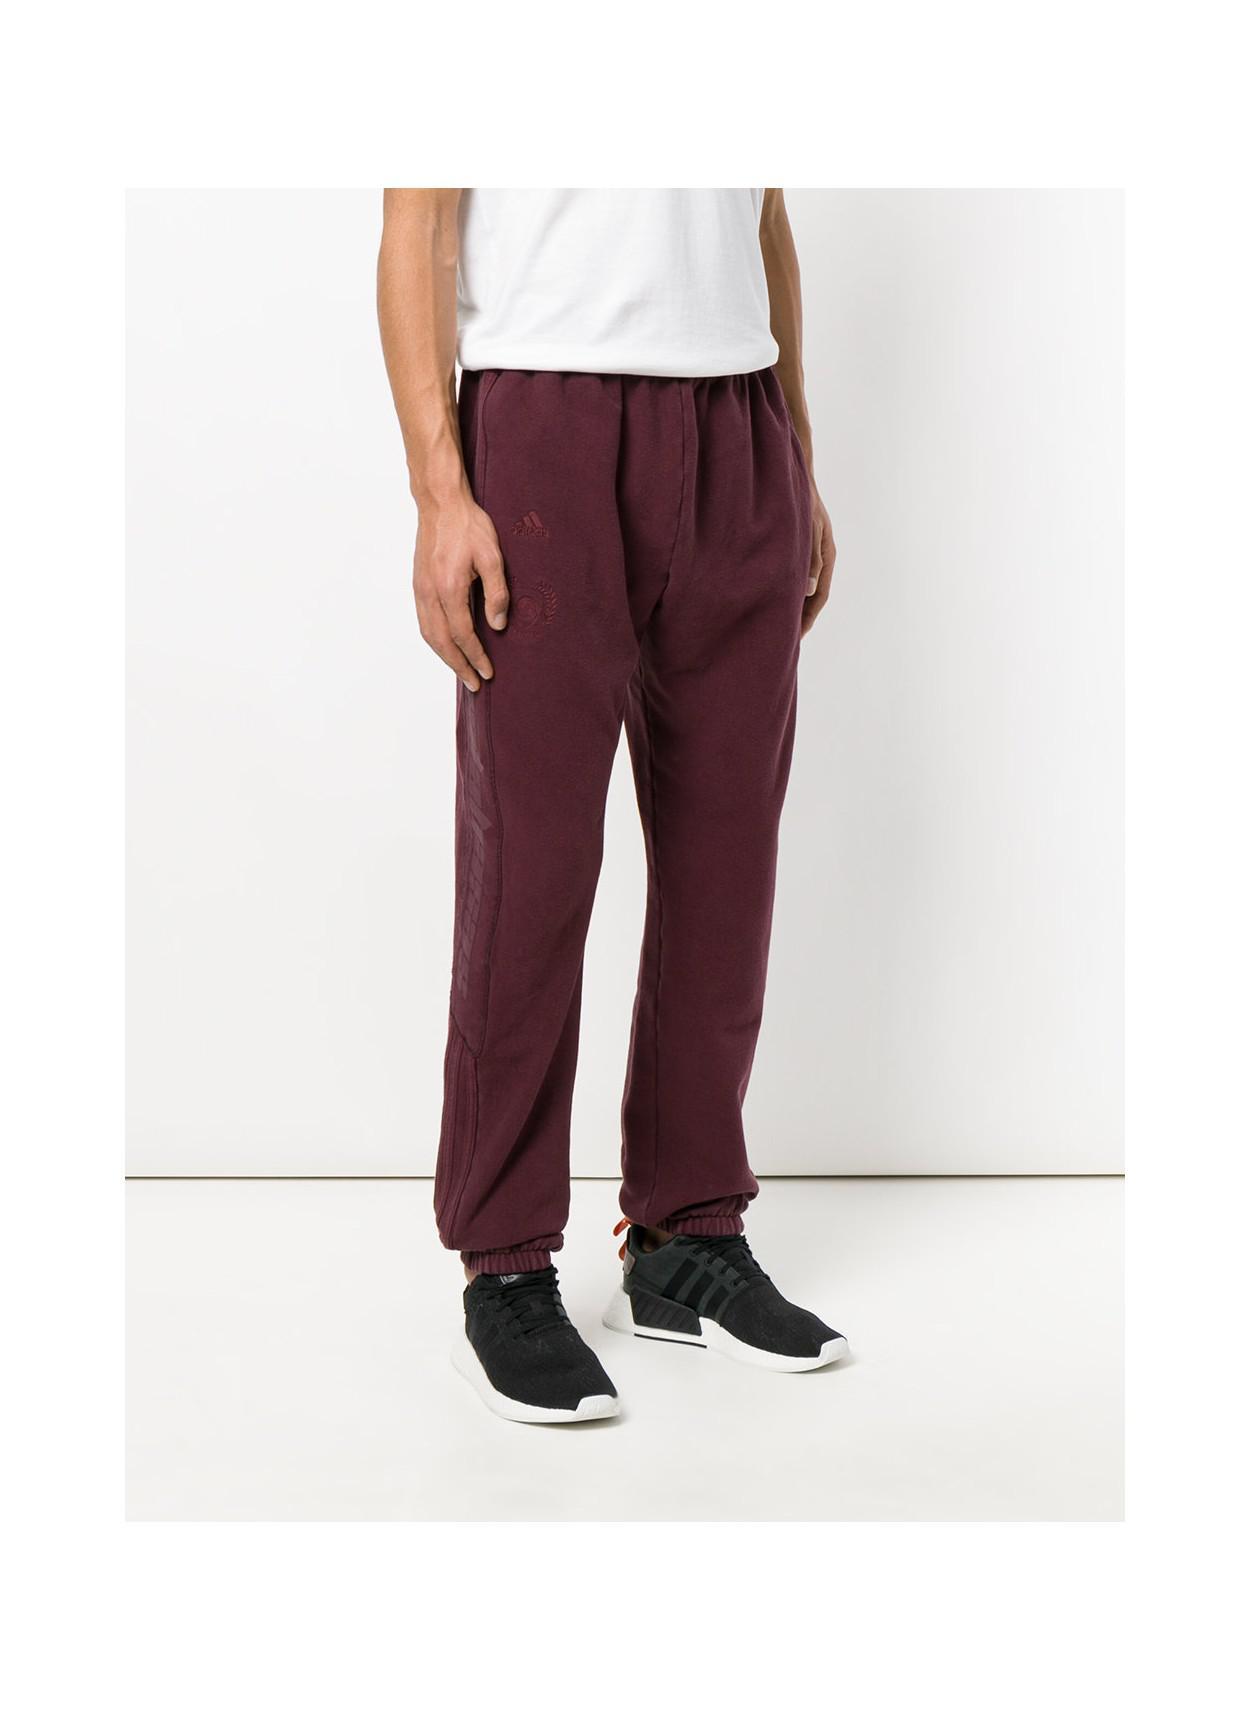 3b19bd4718b00 Lyst - Yeezy Men s Calabasas Track Pants Oxblood in Red for Men ...